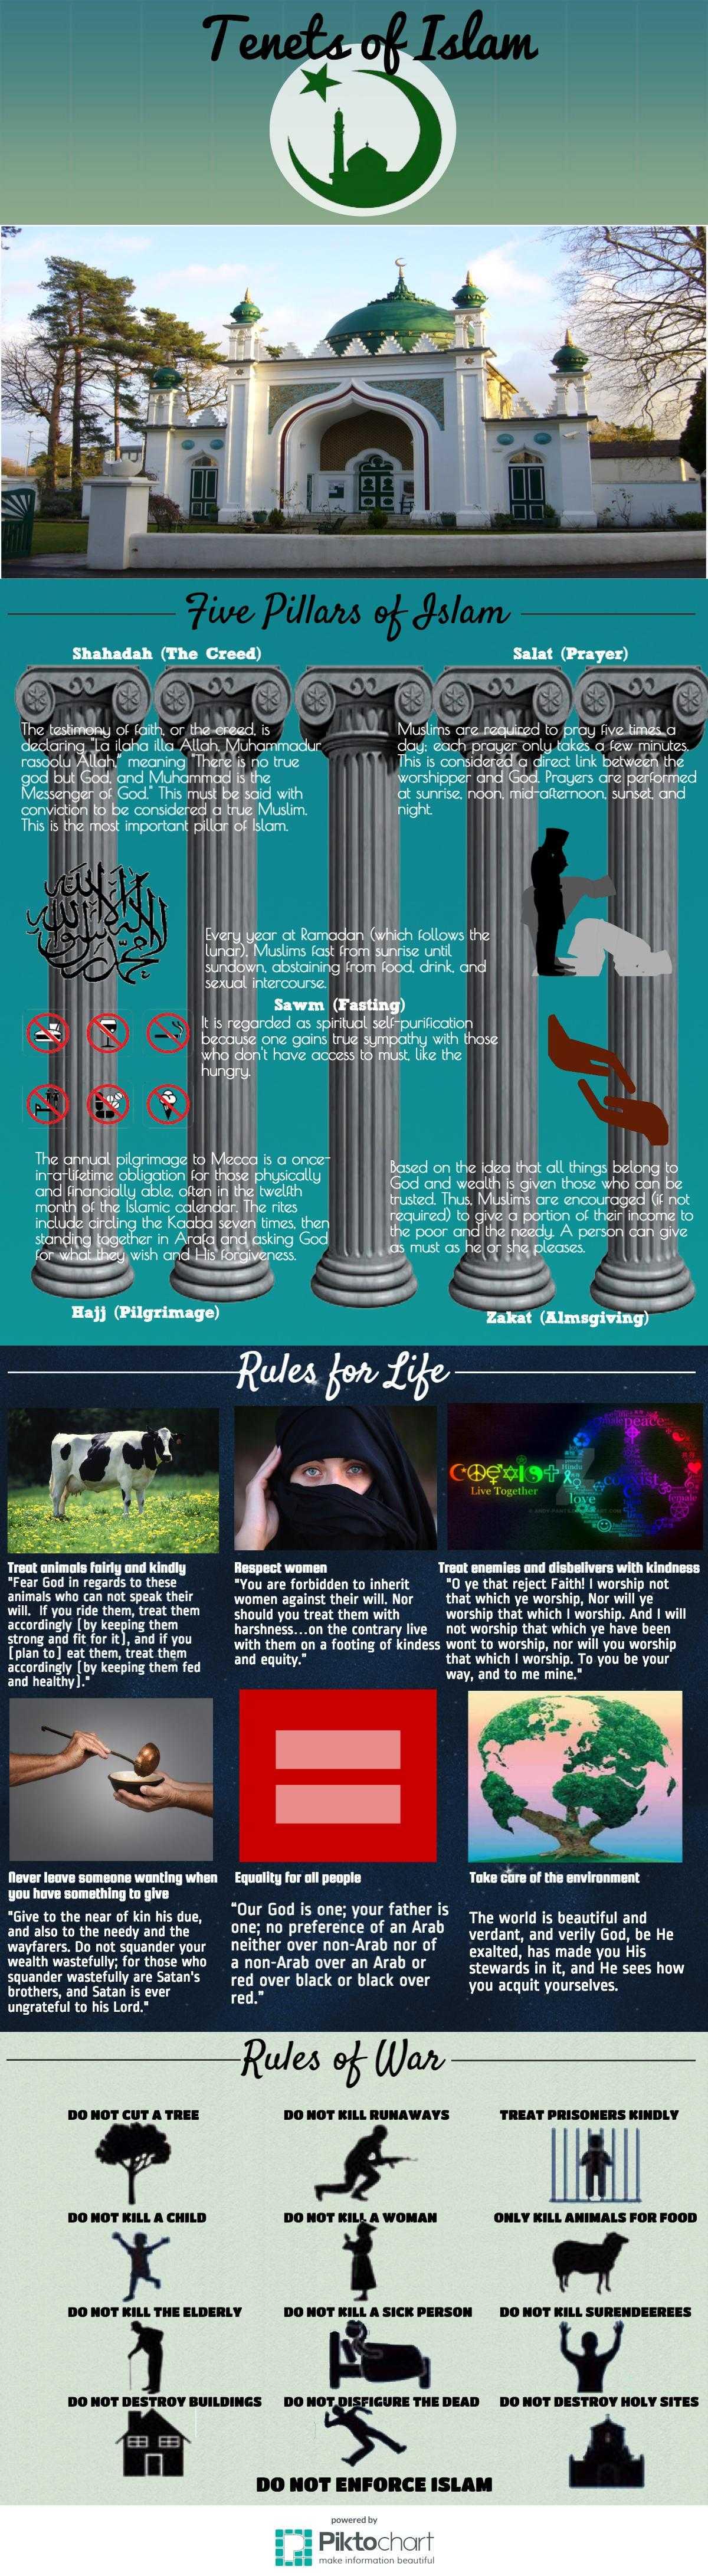 Tenets of Islam